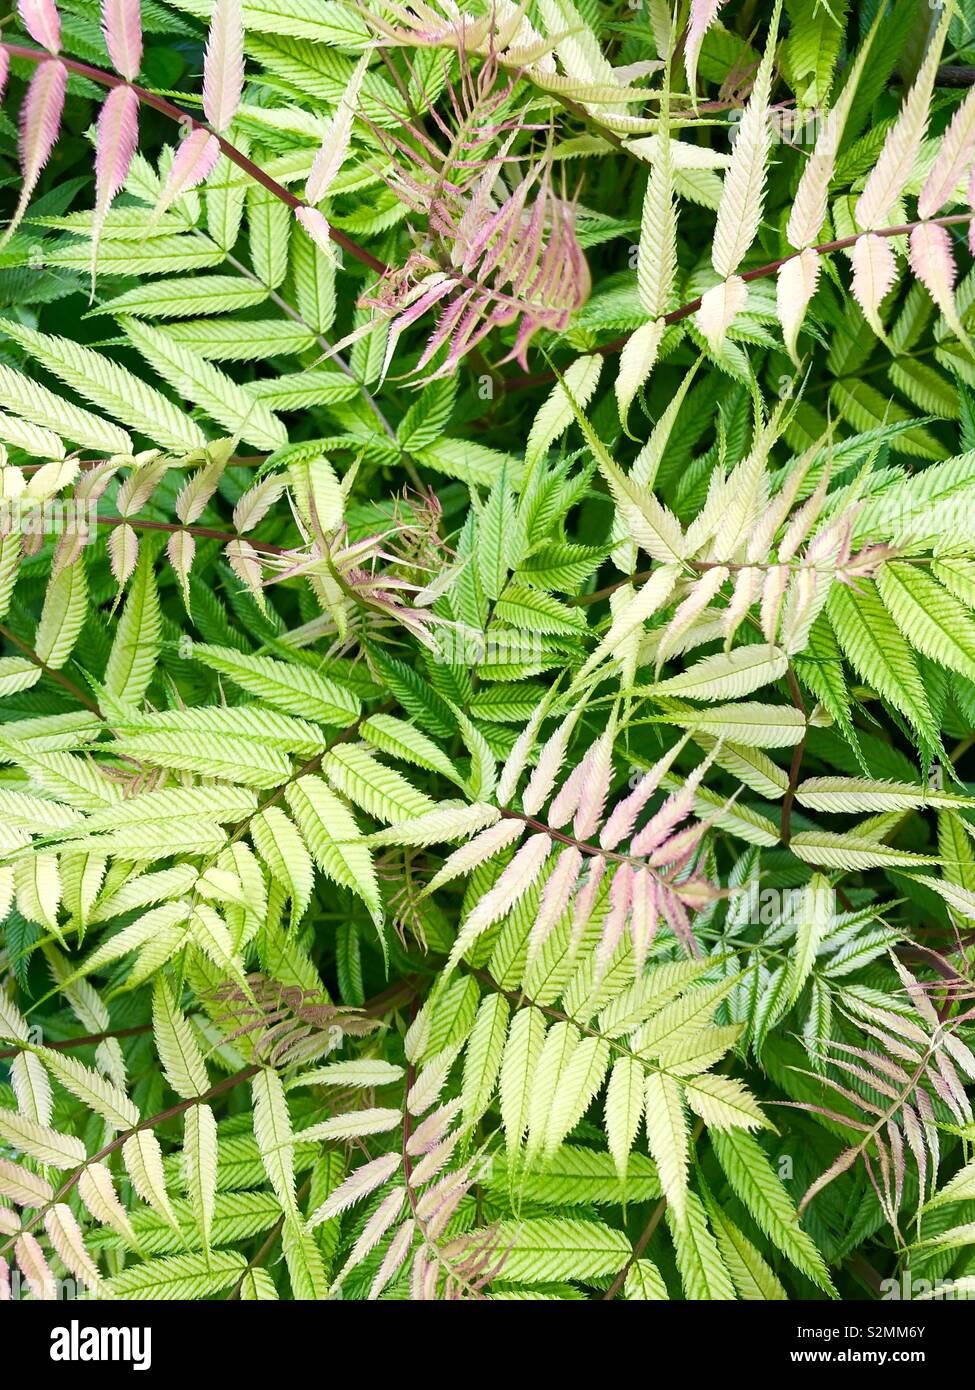 Vollbild Blätter Bild. Stockbild